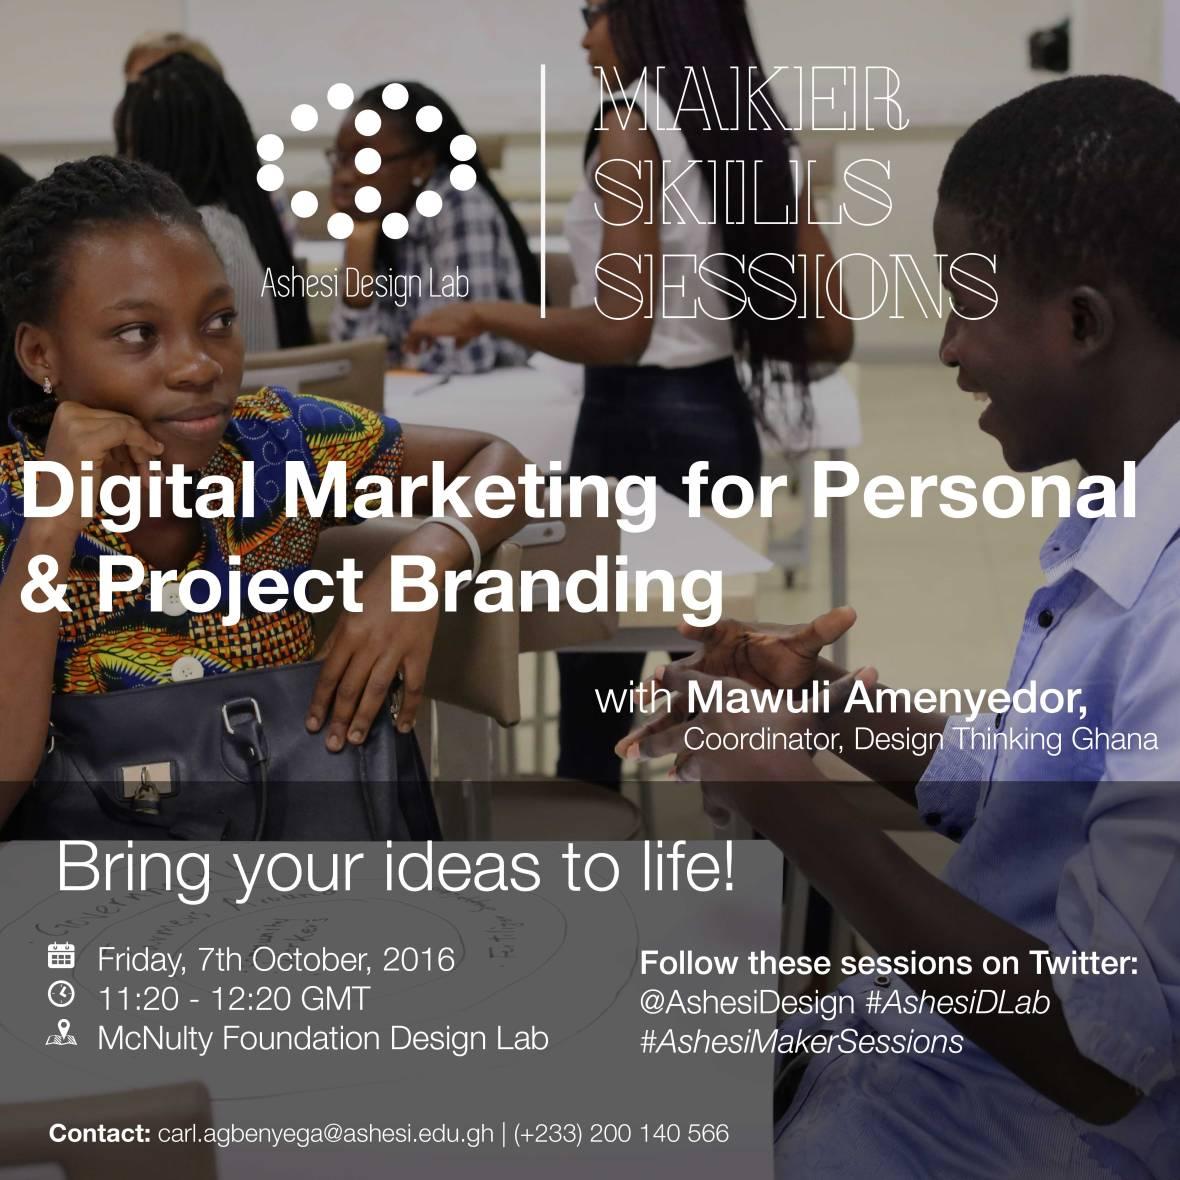 ashesi-dlab-maker-skills-sessions-digital-marketing-0-01